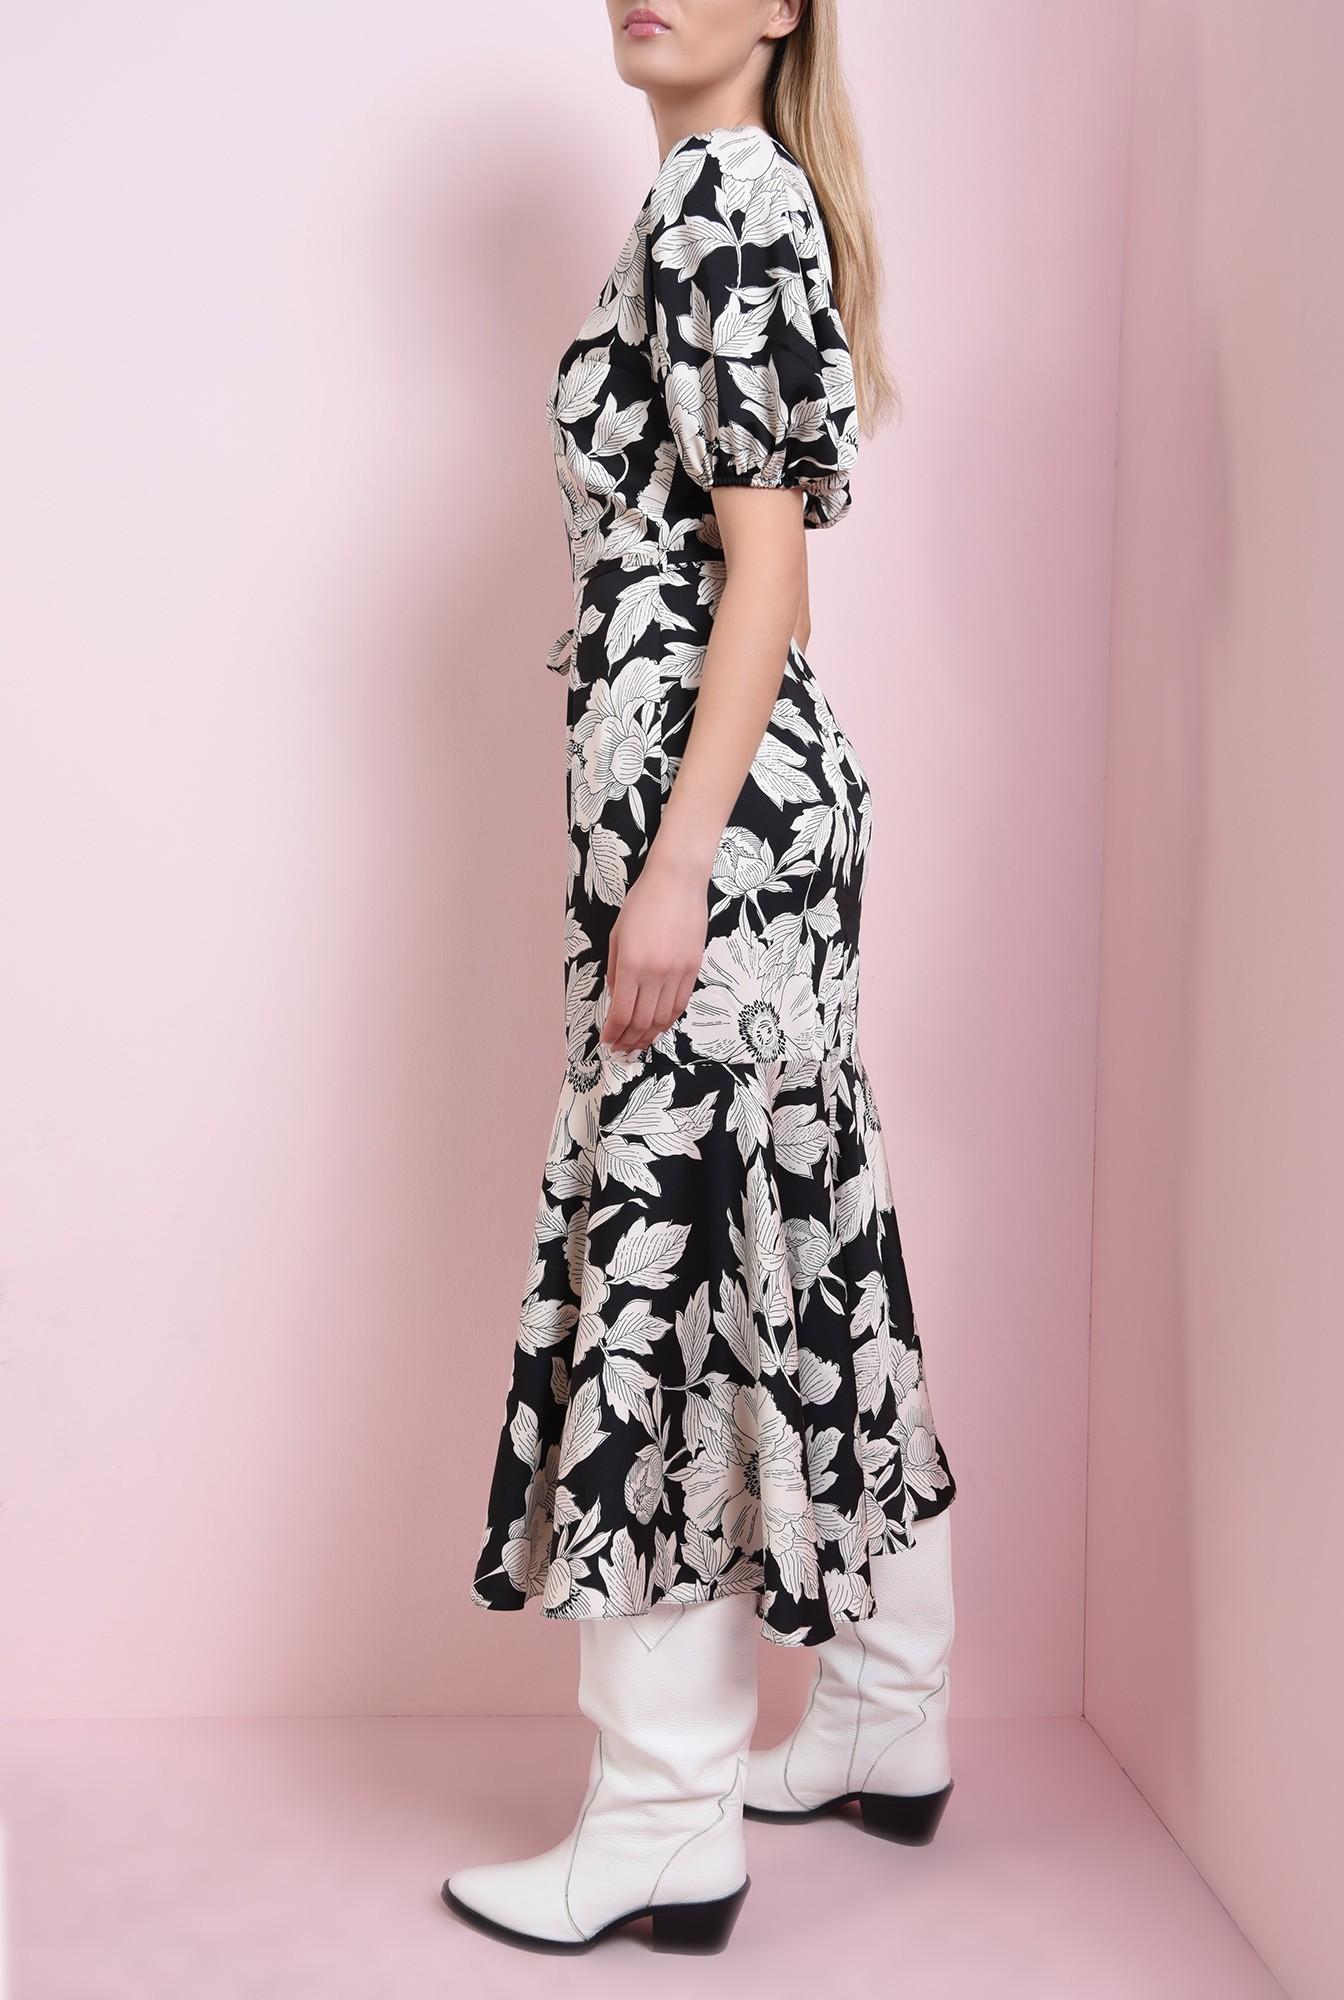 2 - 360 - rochie neagra, cu flori, Poema